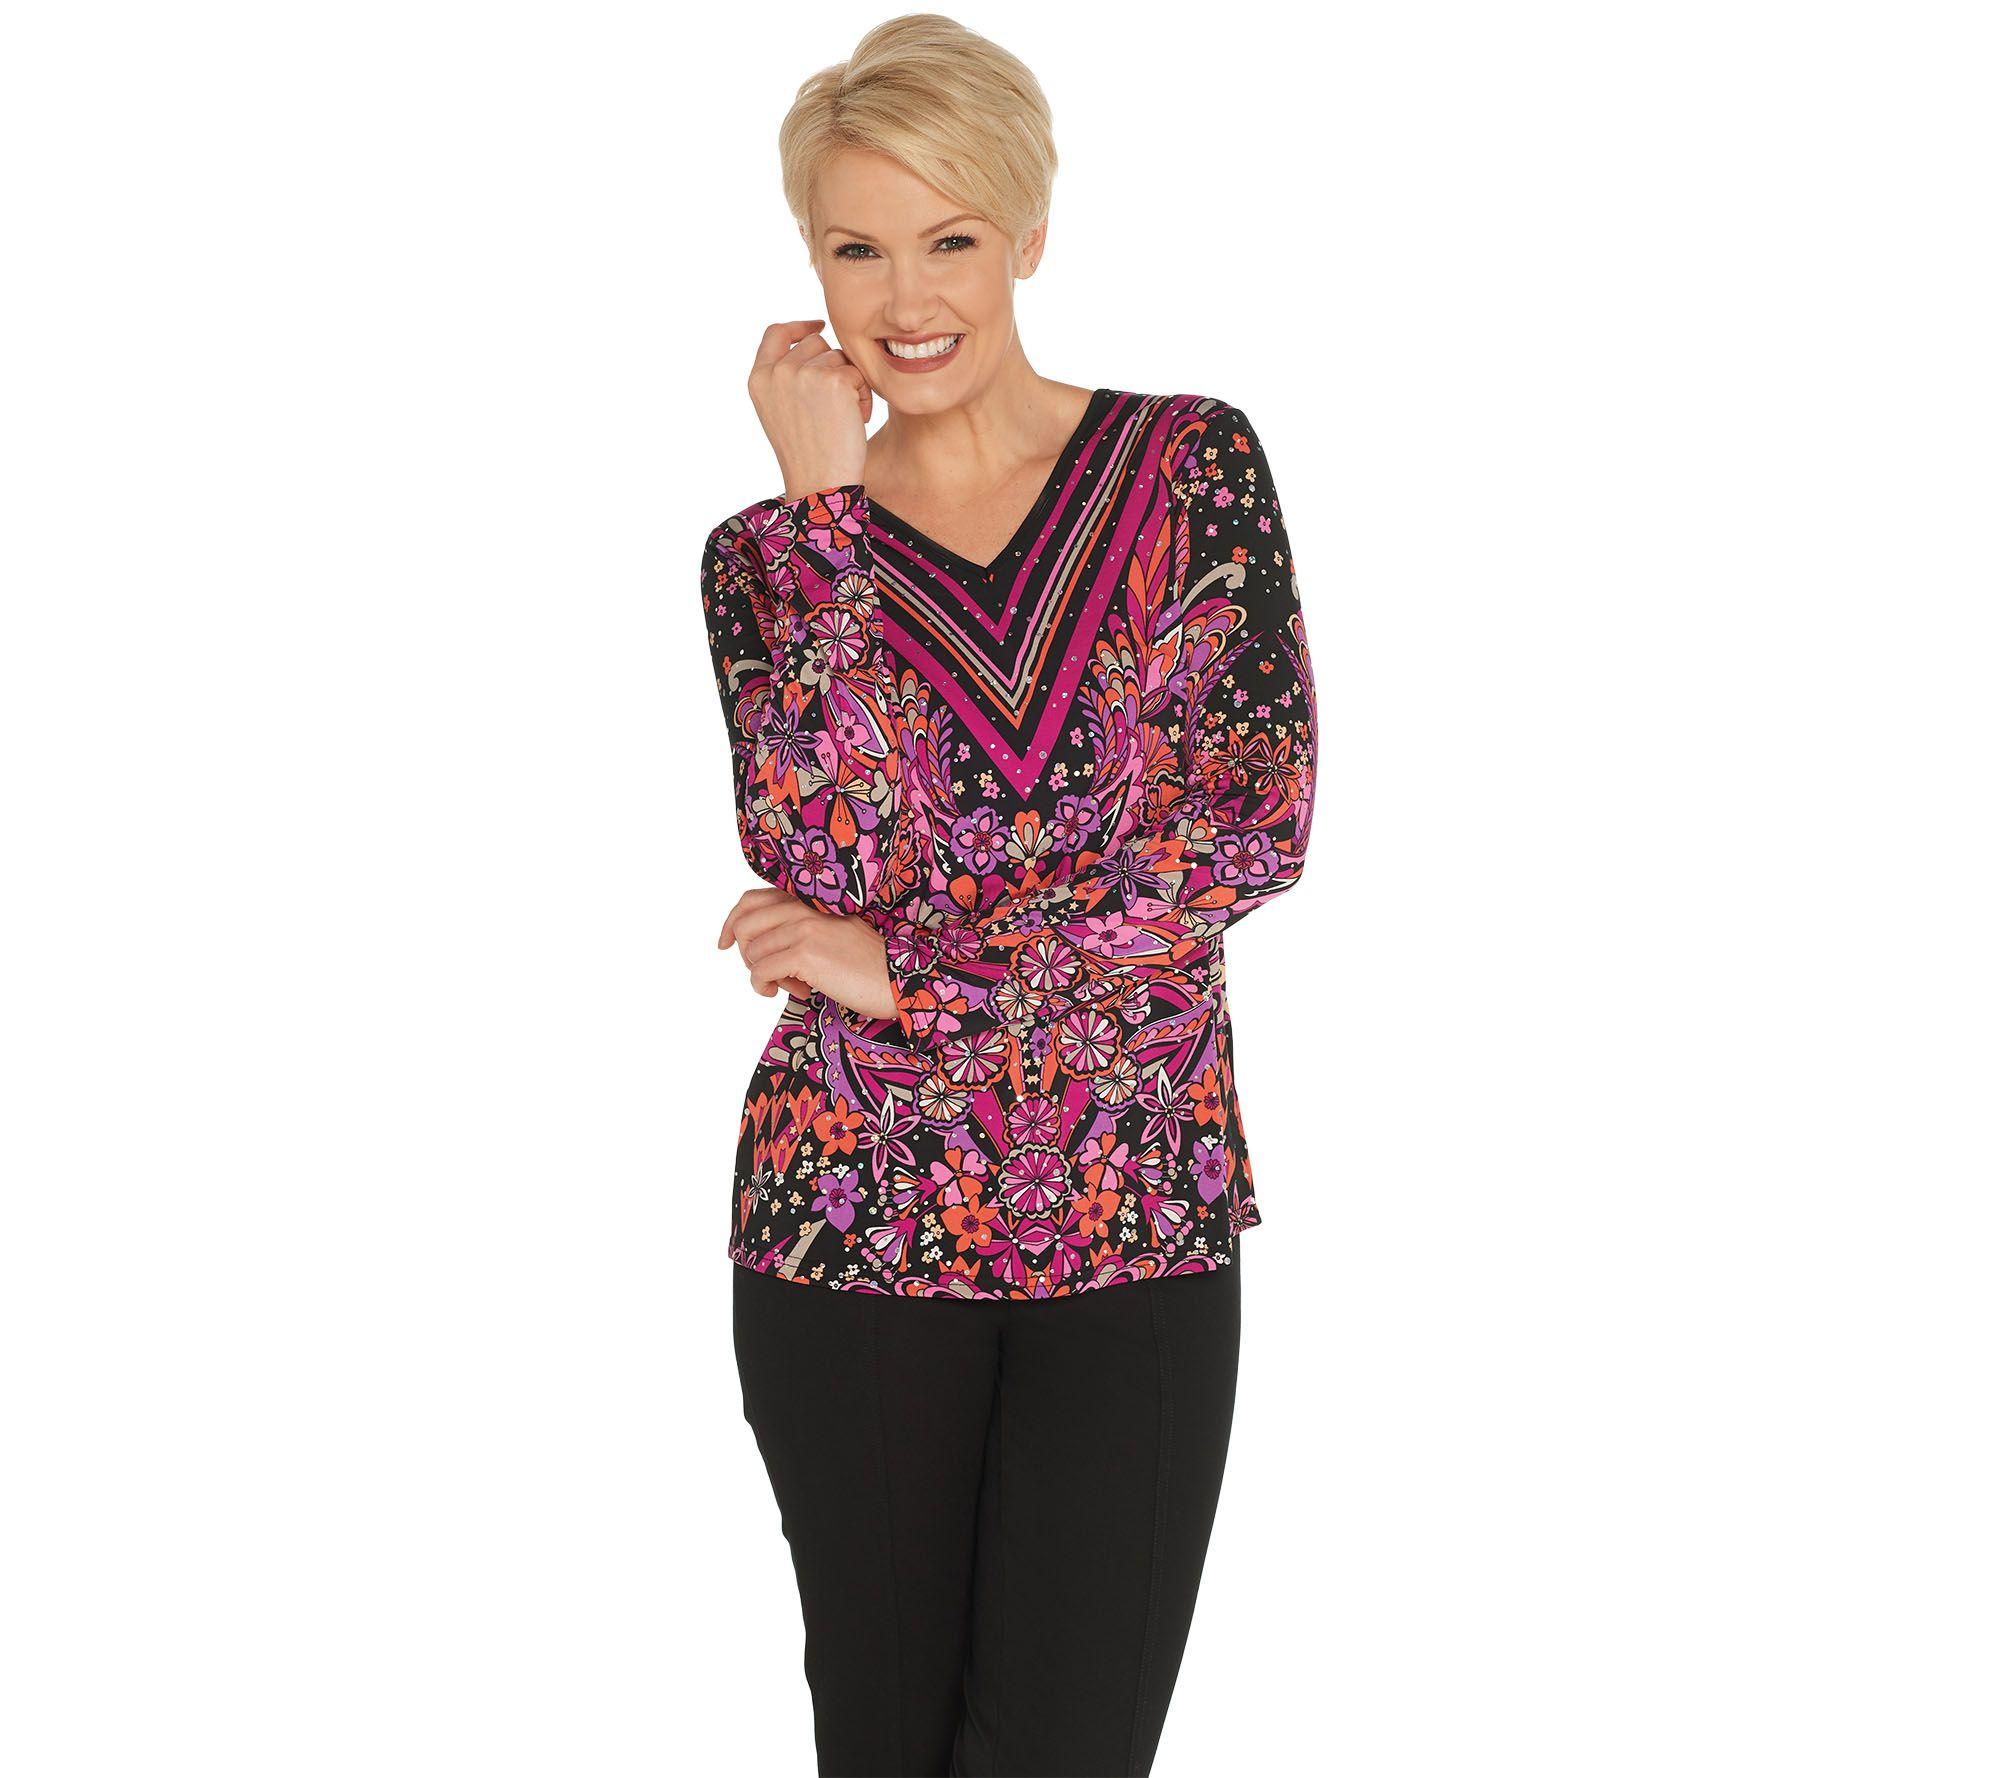 e6a717679dd Bob Mackie Floral Print Pullover Knit Top - Page 1 — QVC.com